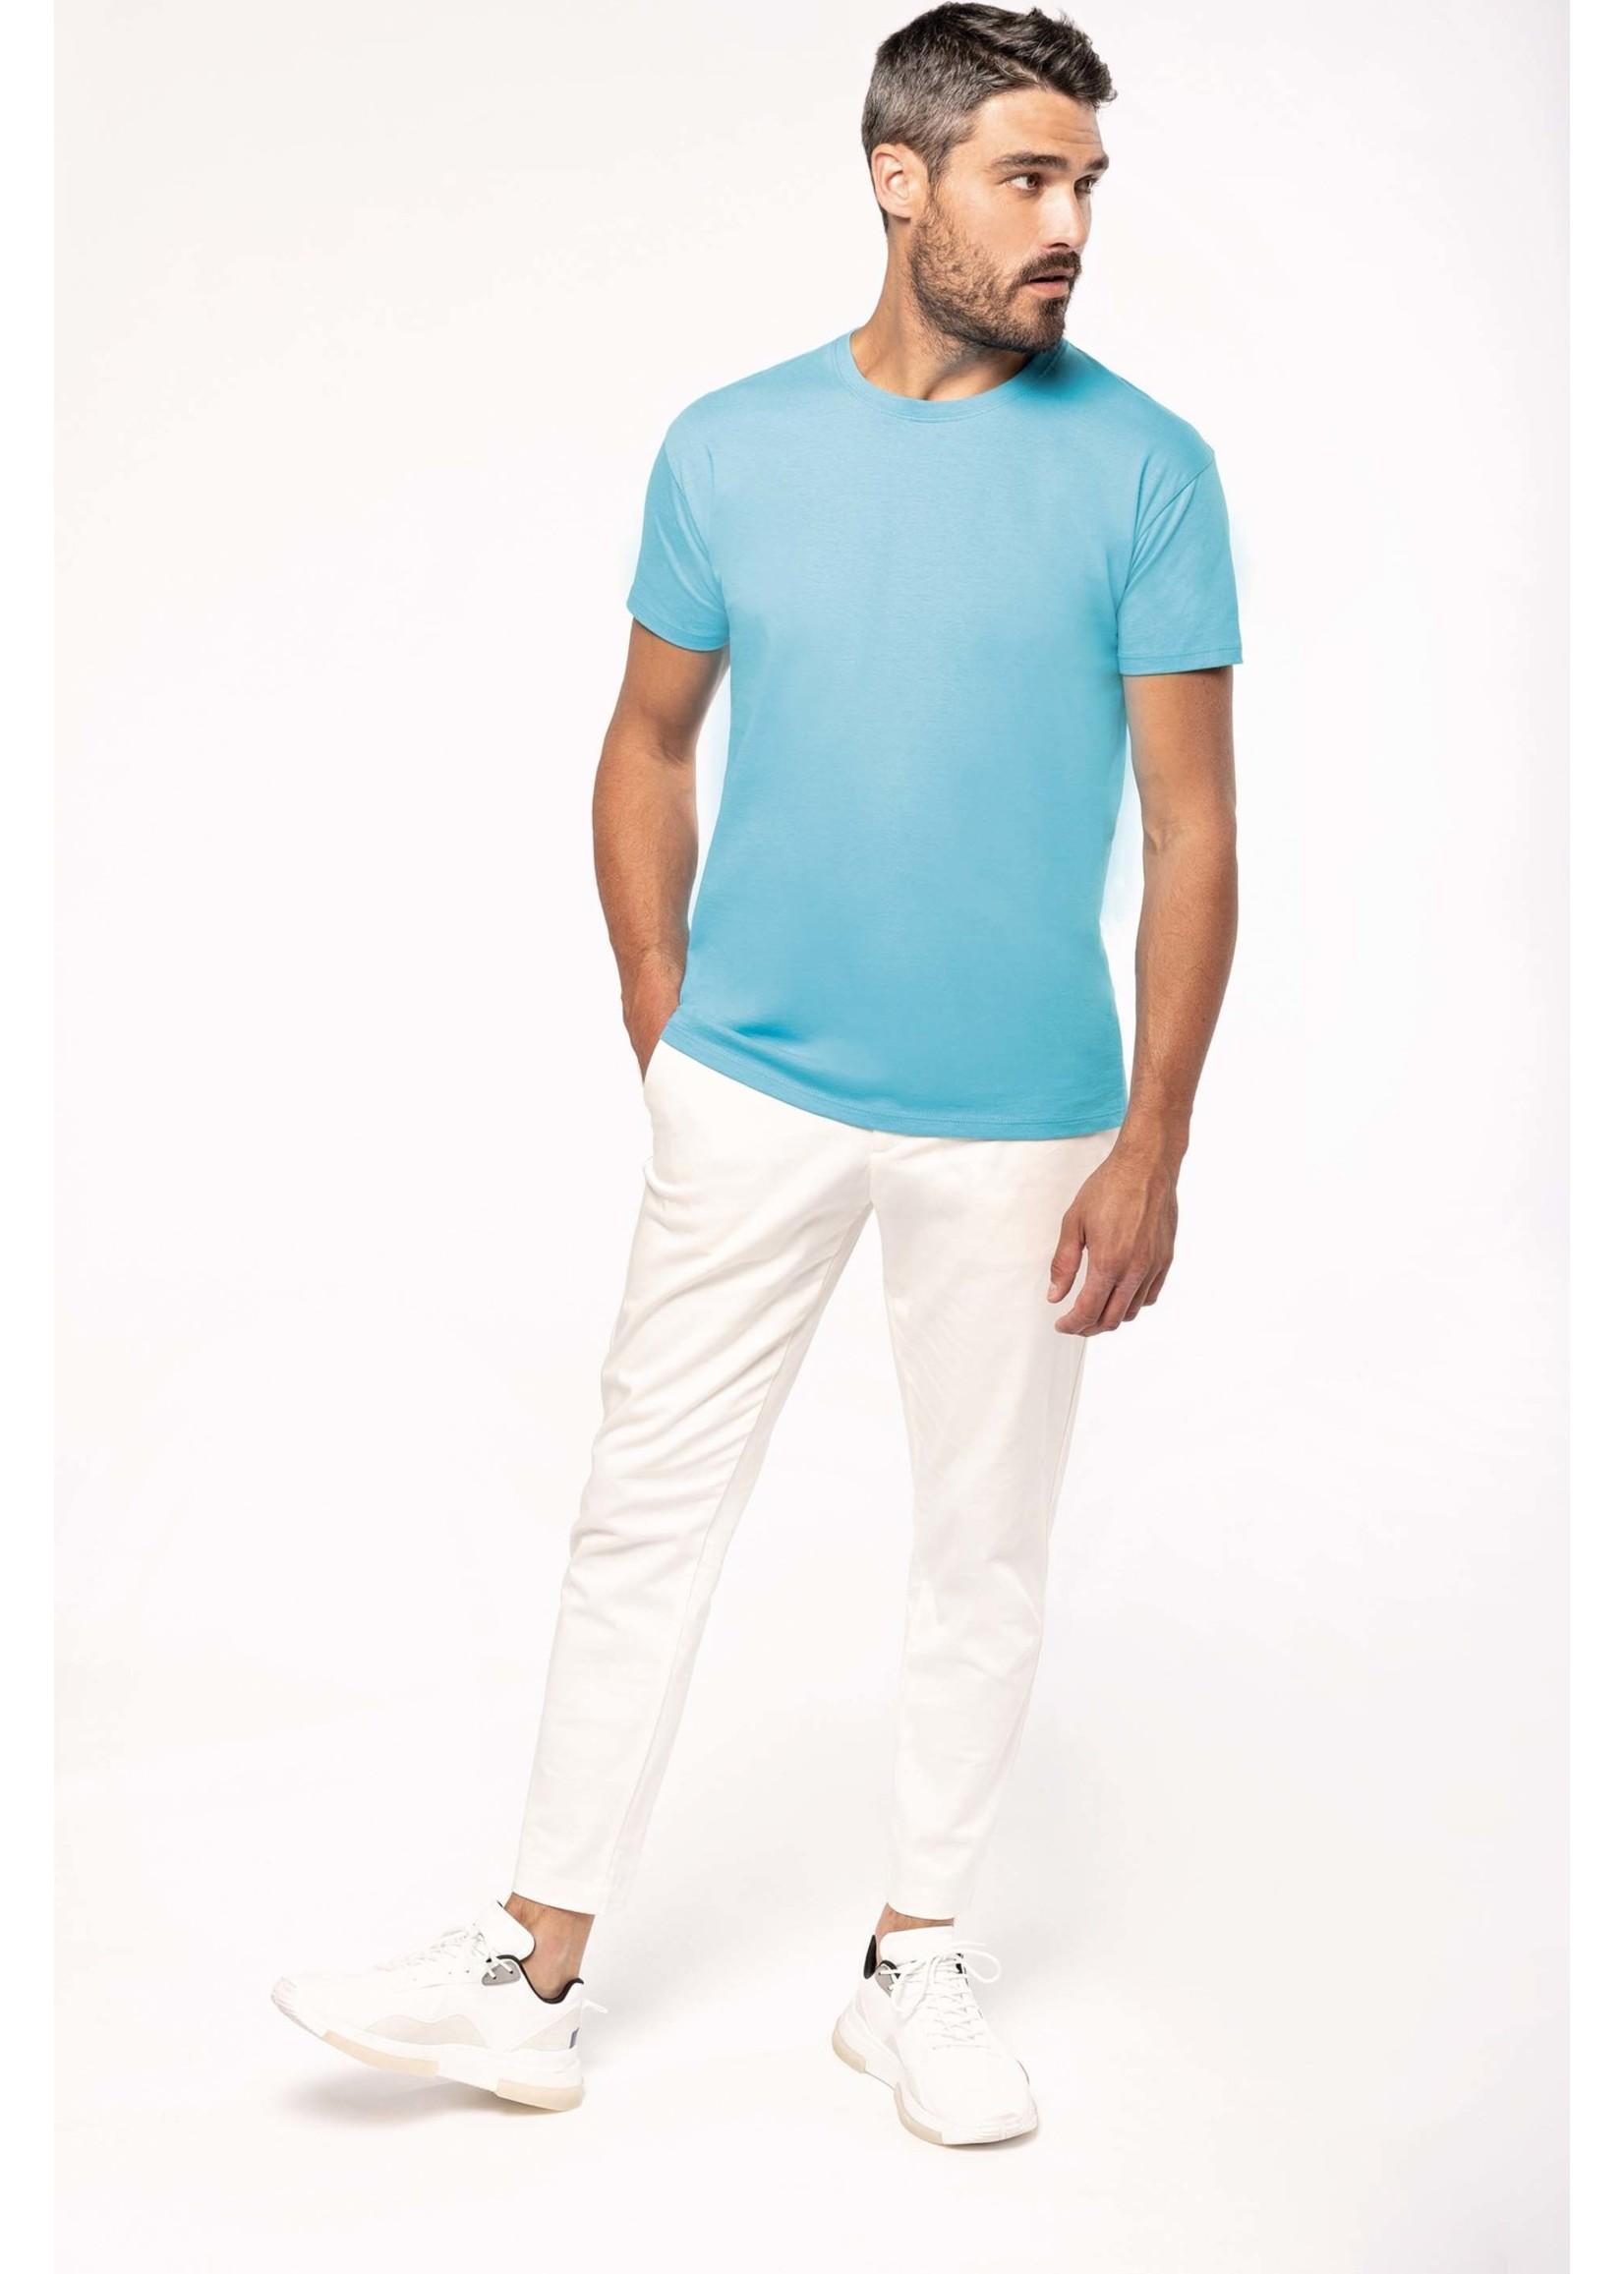 Eco-Friendly Unisex T-shirt - Sea-Turquoise